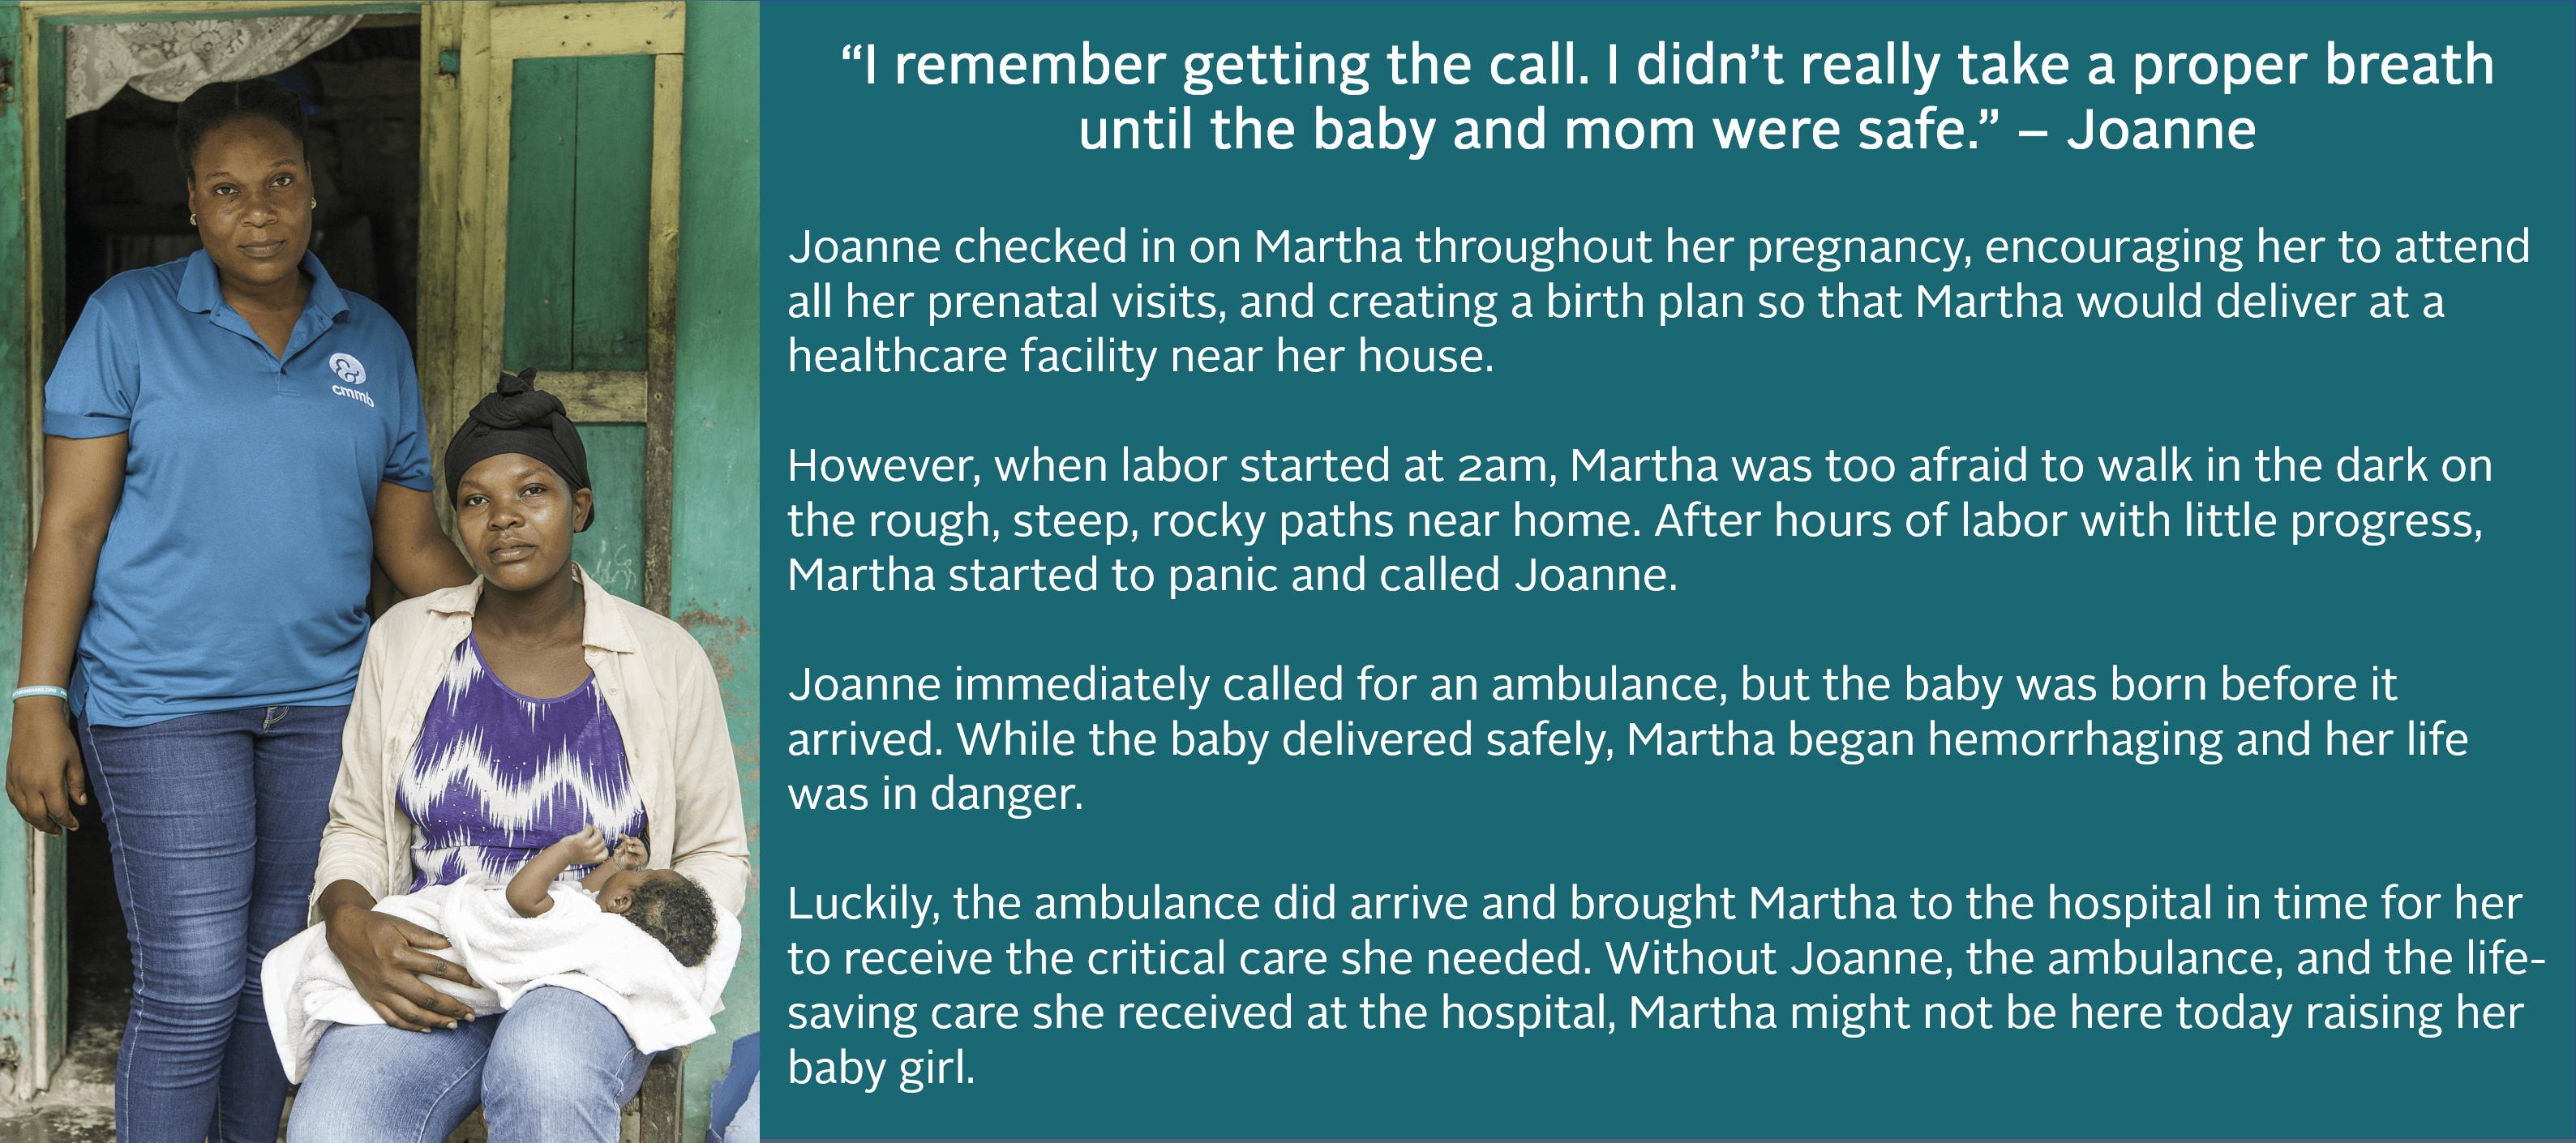 joanne anecdote edited